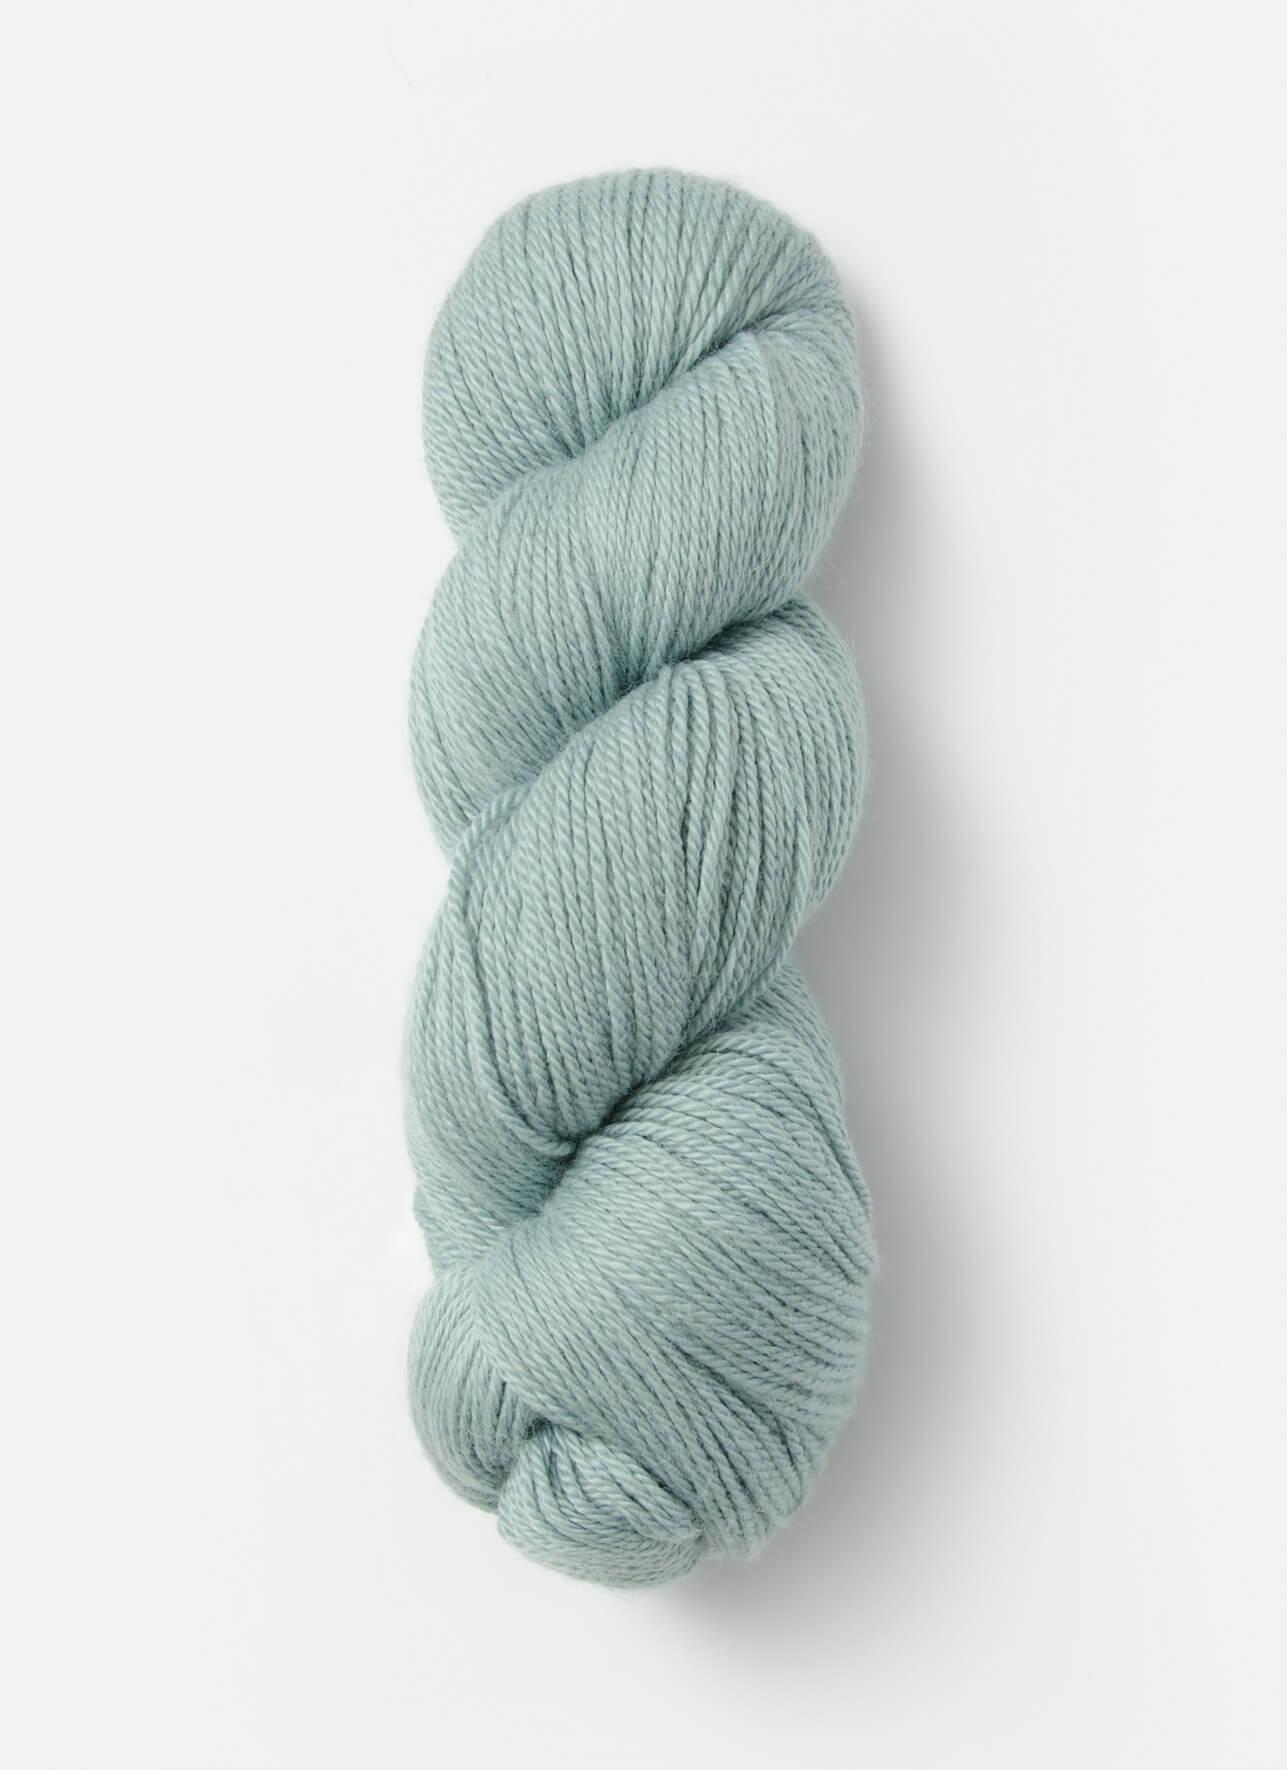 No. 708: Seaglass